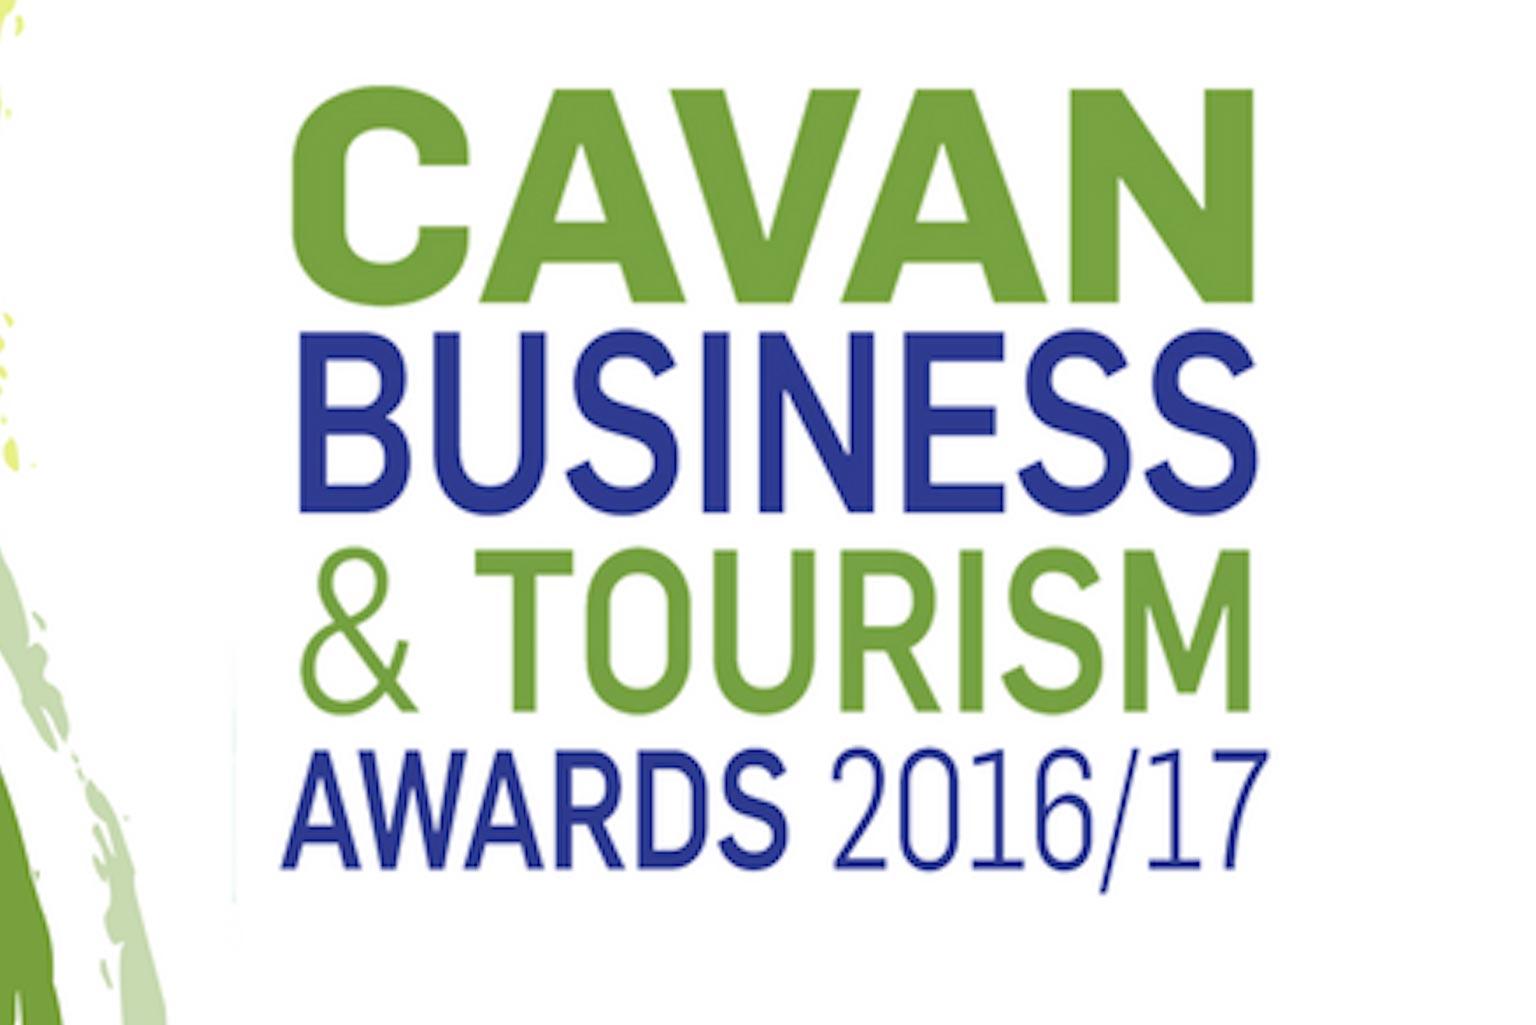 Pureheat wins Cavan Business and Tourism Awards - AngloCelt